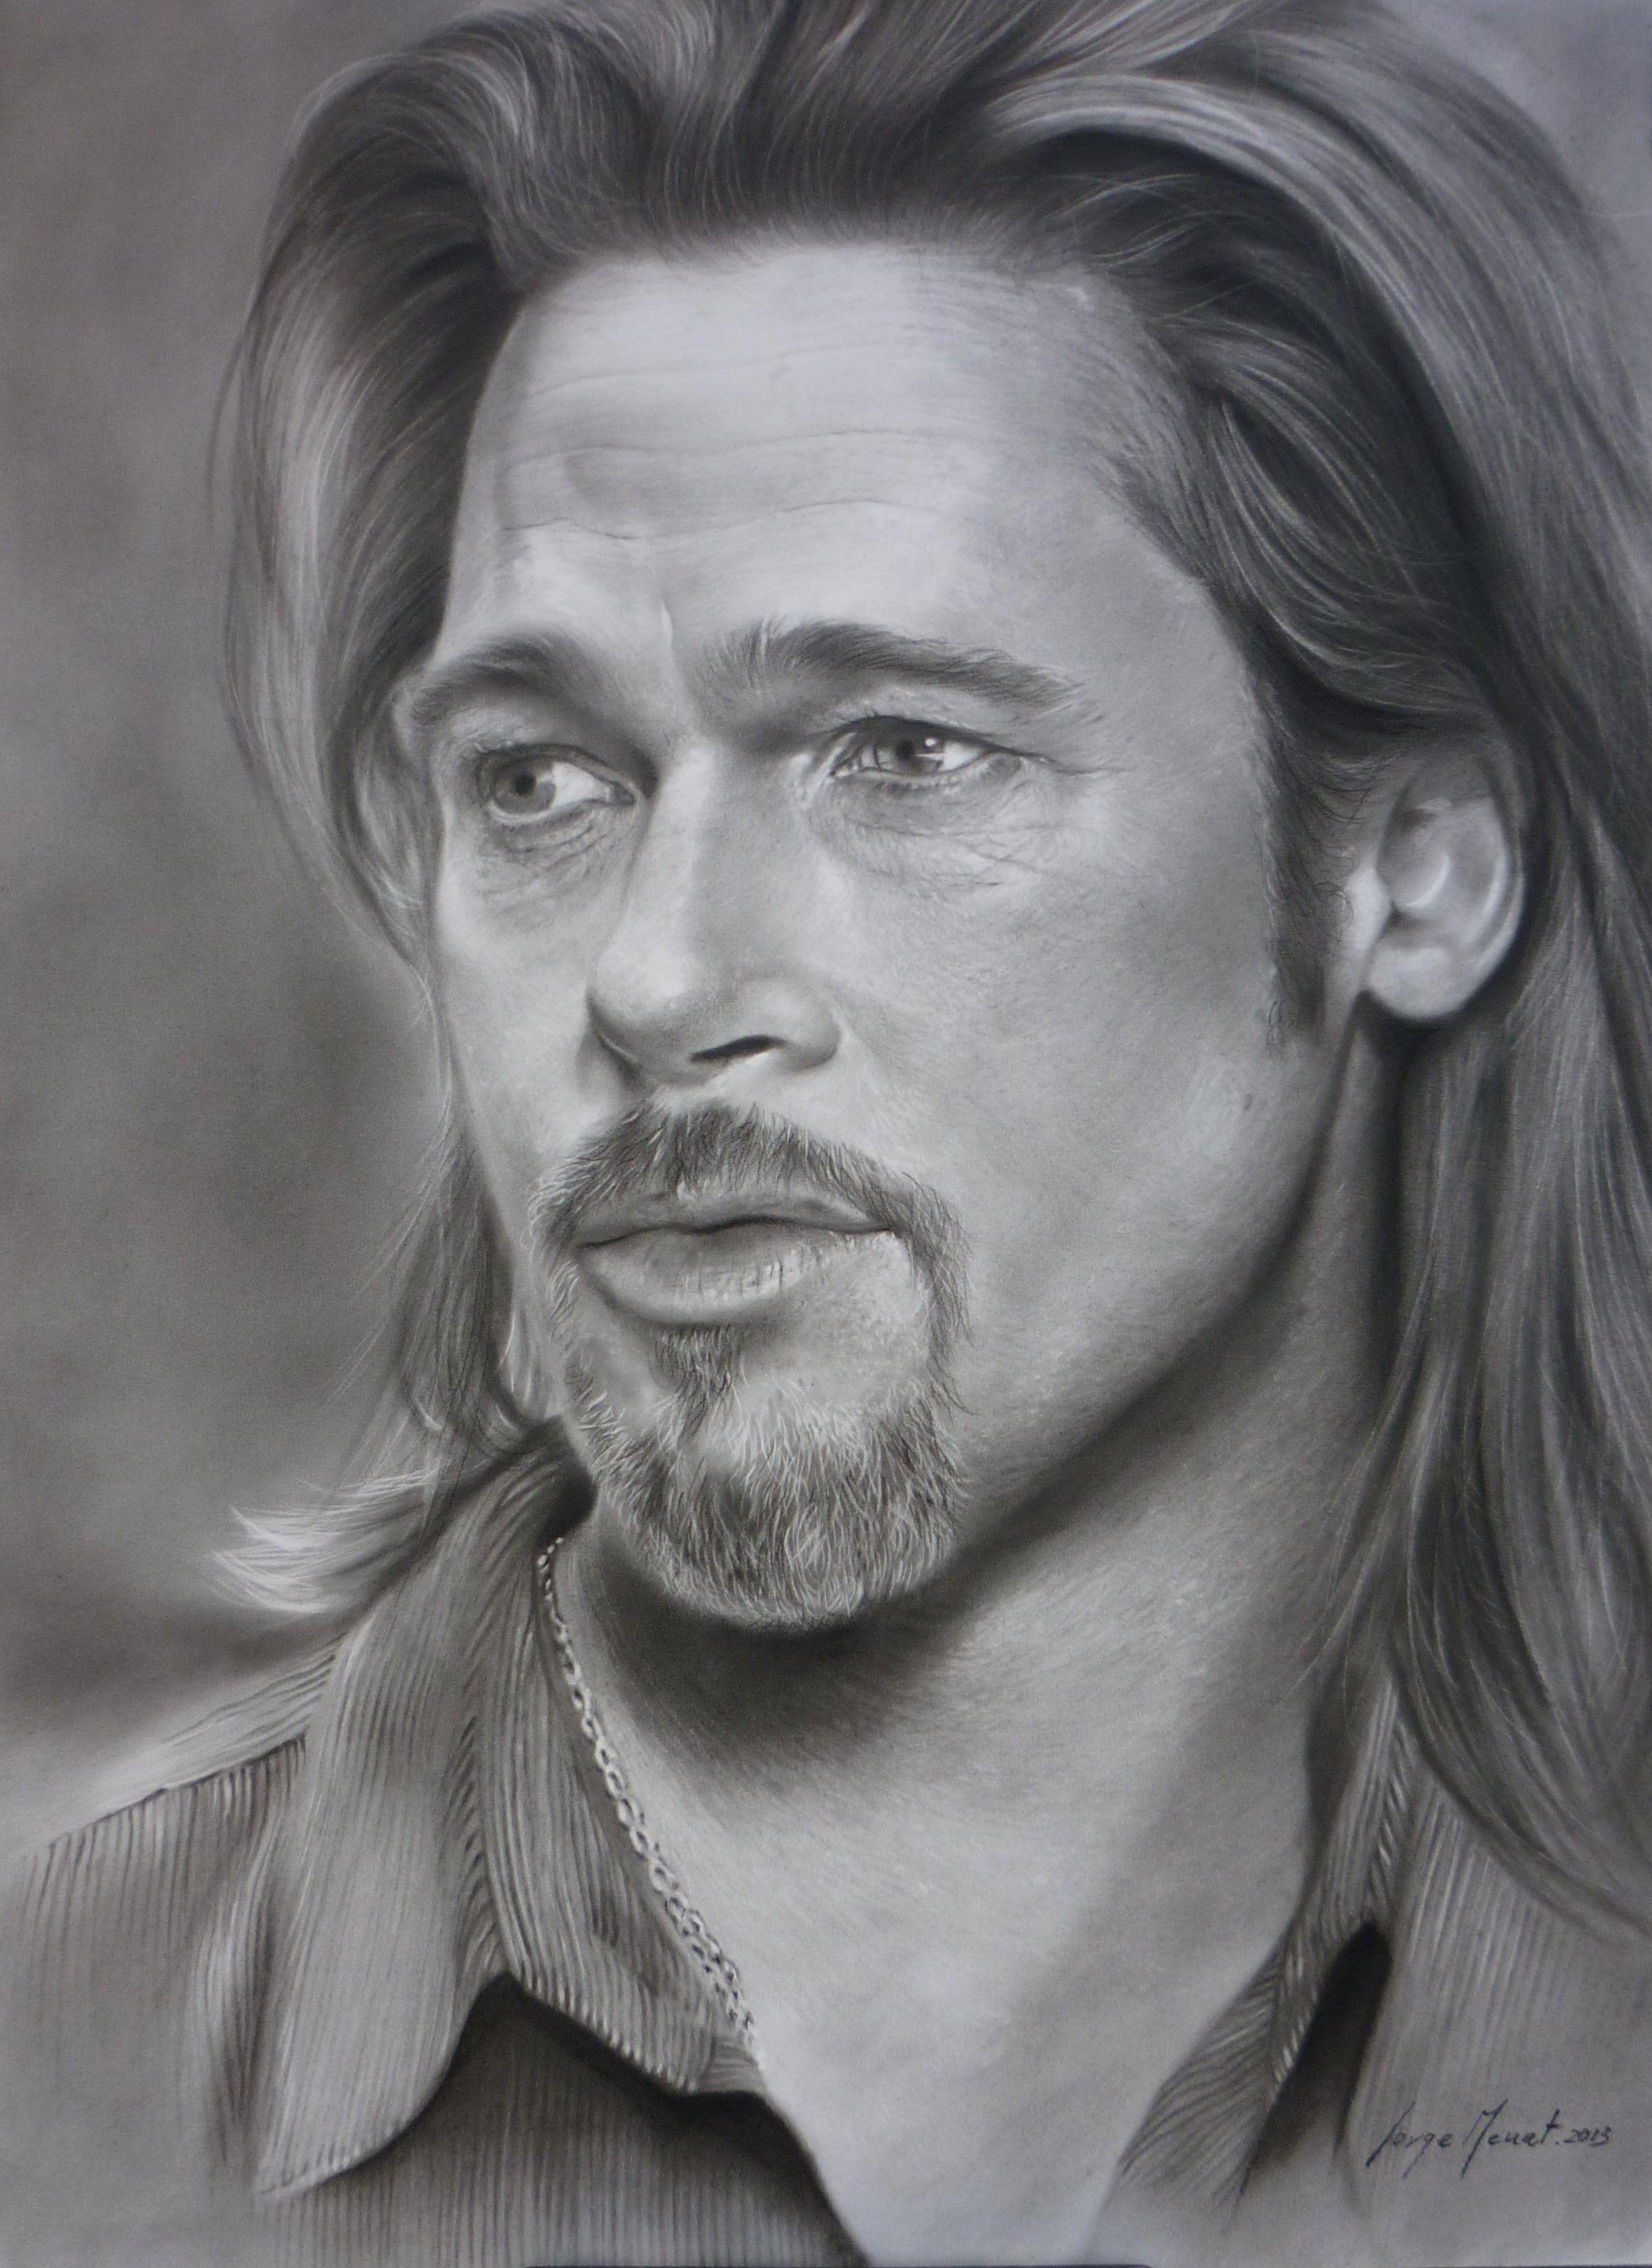 Brad Pitt Retrato Al Carboncillo 50x70 Retratos Fotos De Famosos Dibujos Con Carboncillo